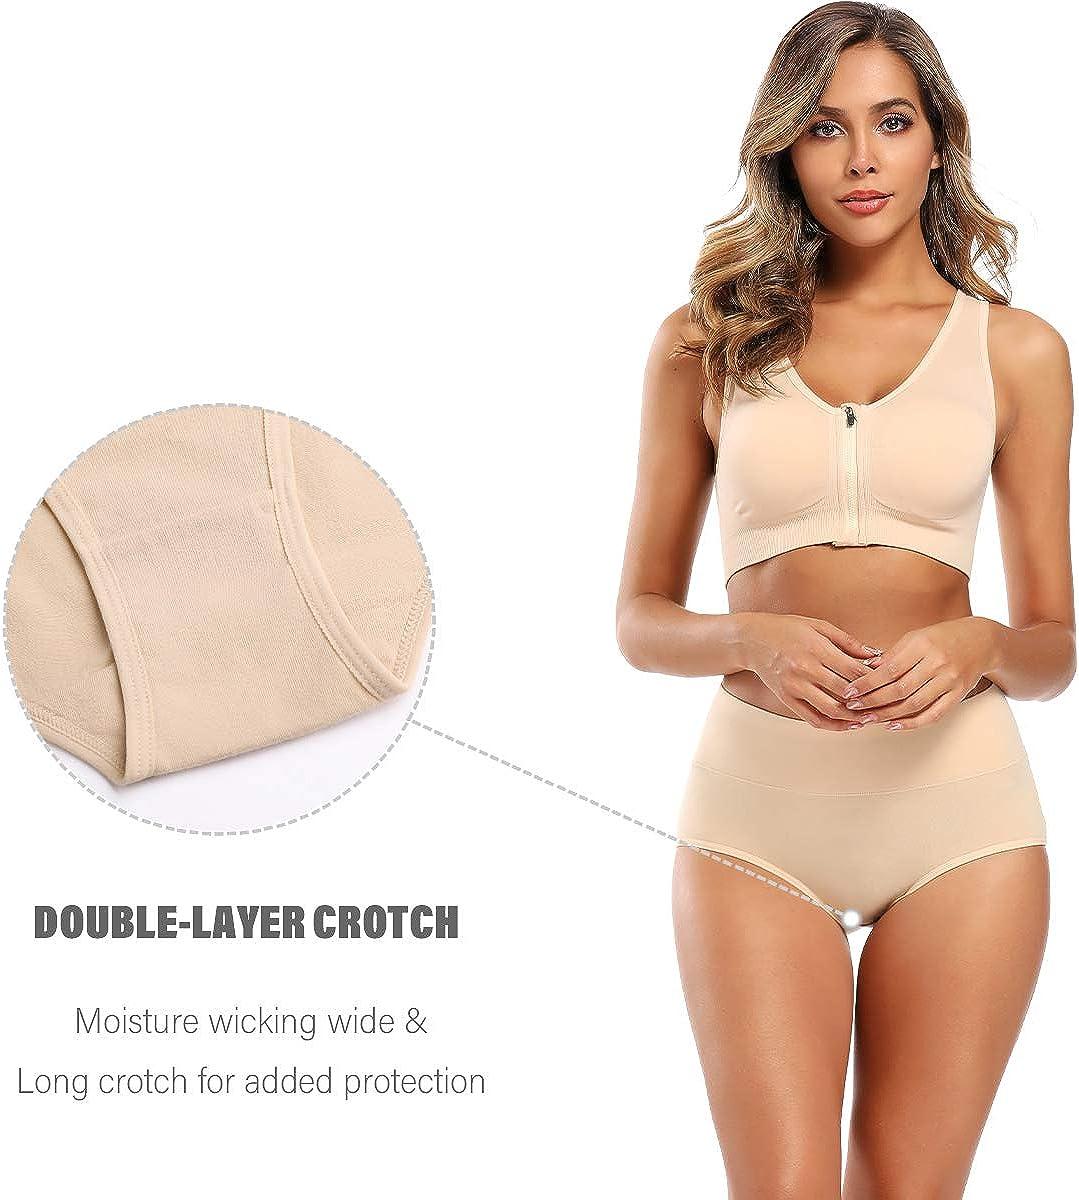 Molasus Womens High Waist Cotton Post Partum Briefs Underwear C Section Panties Soft Breathable Full Coverage Underpants